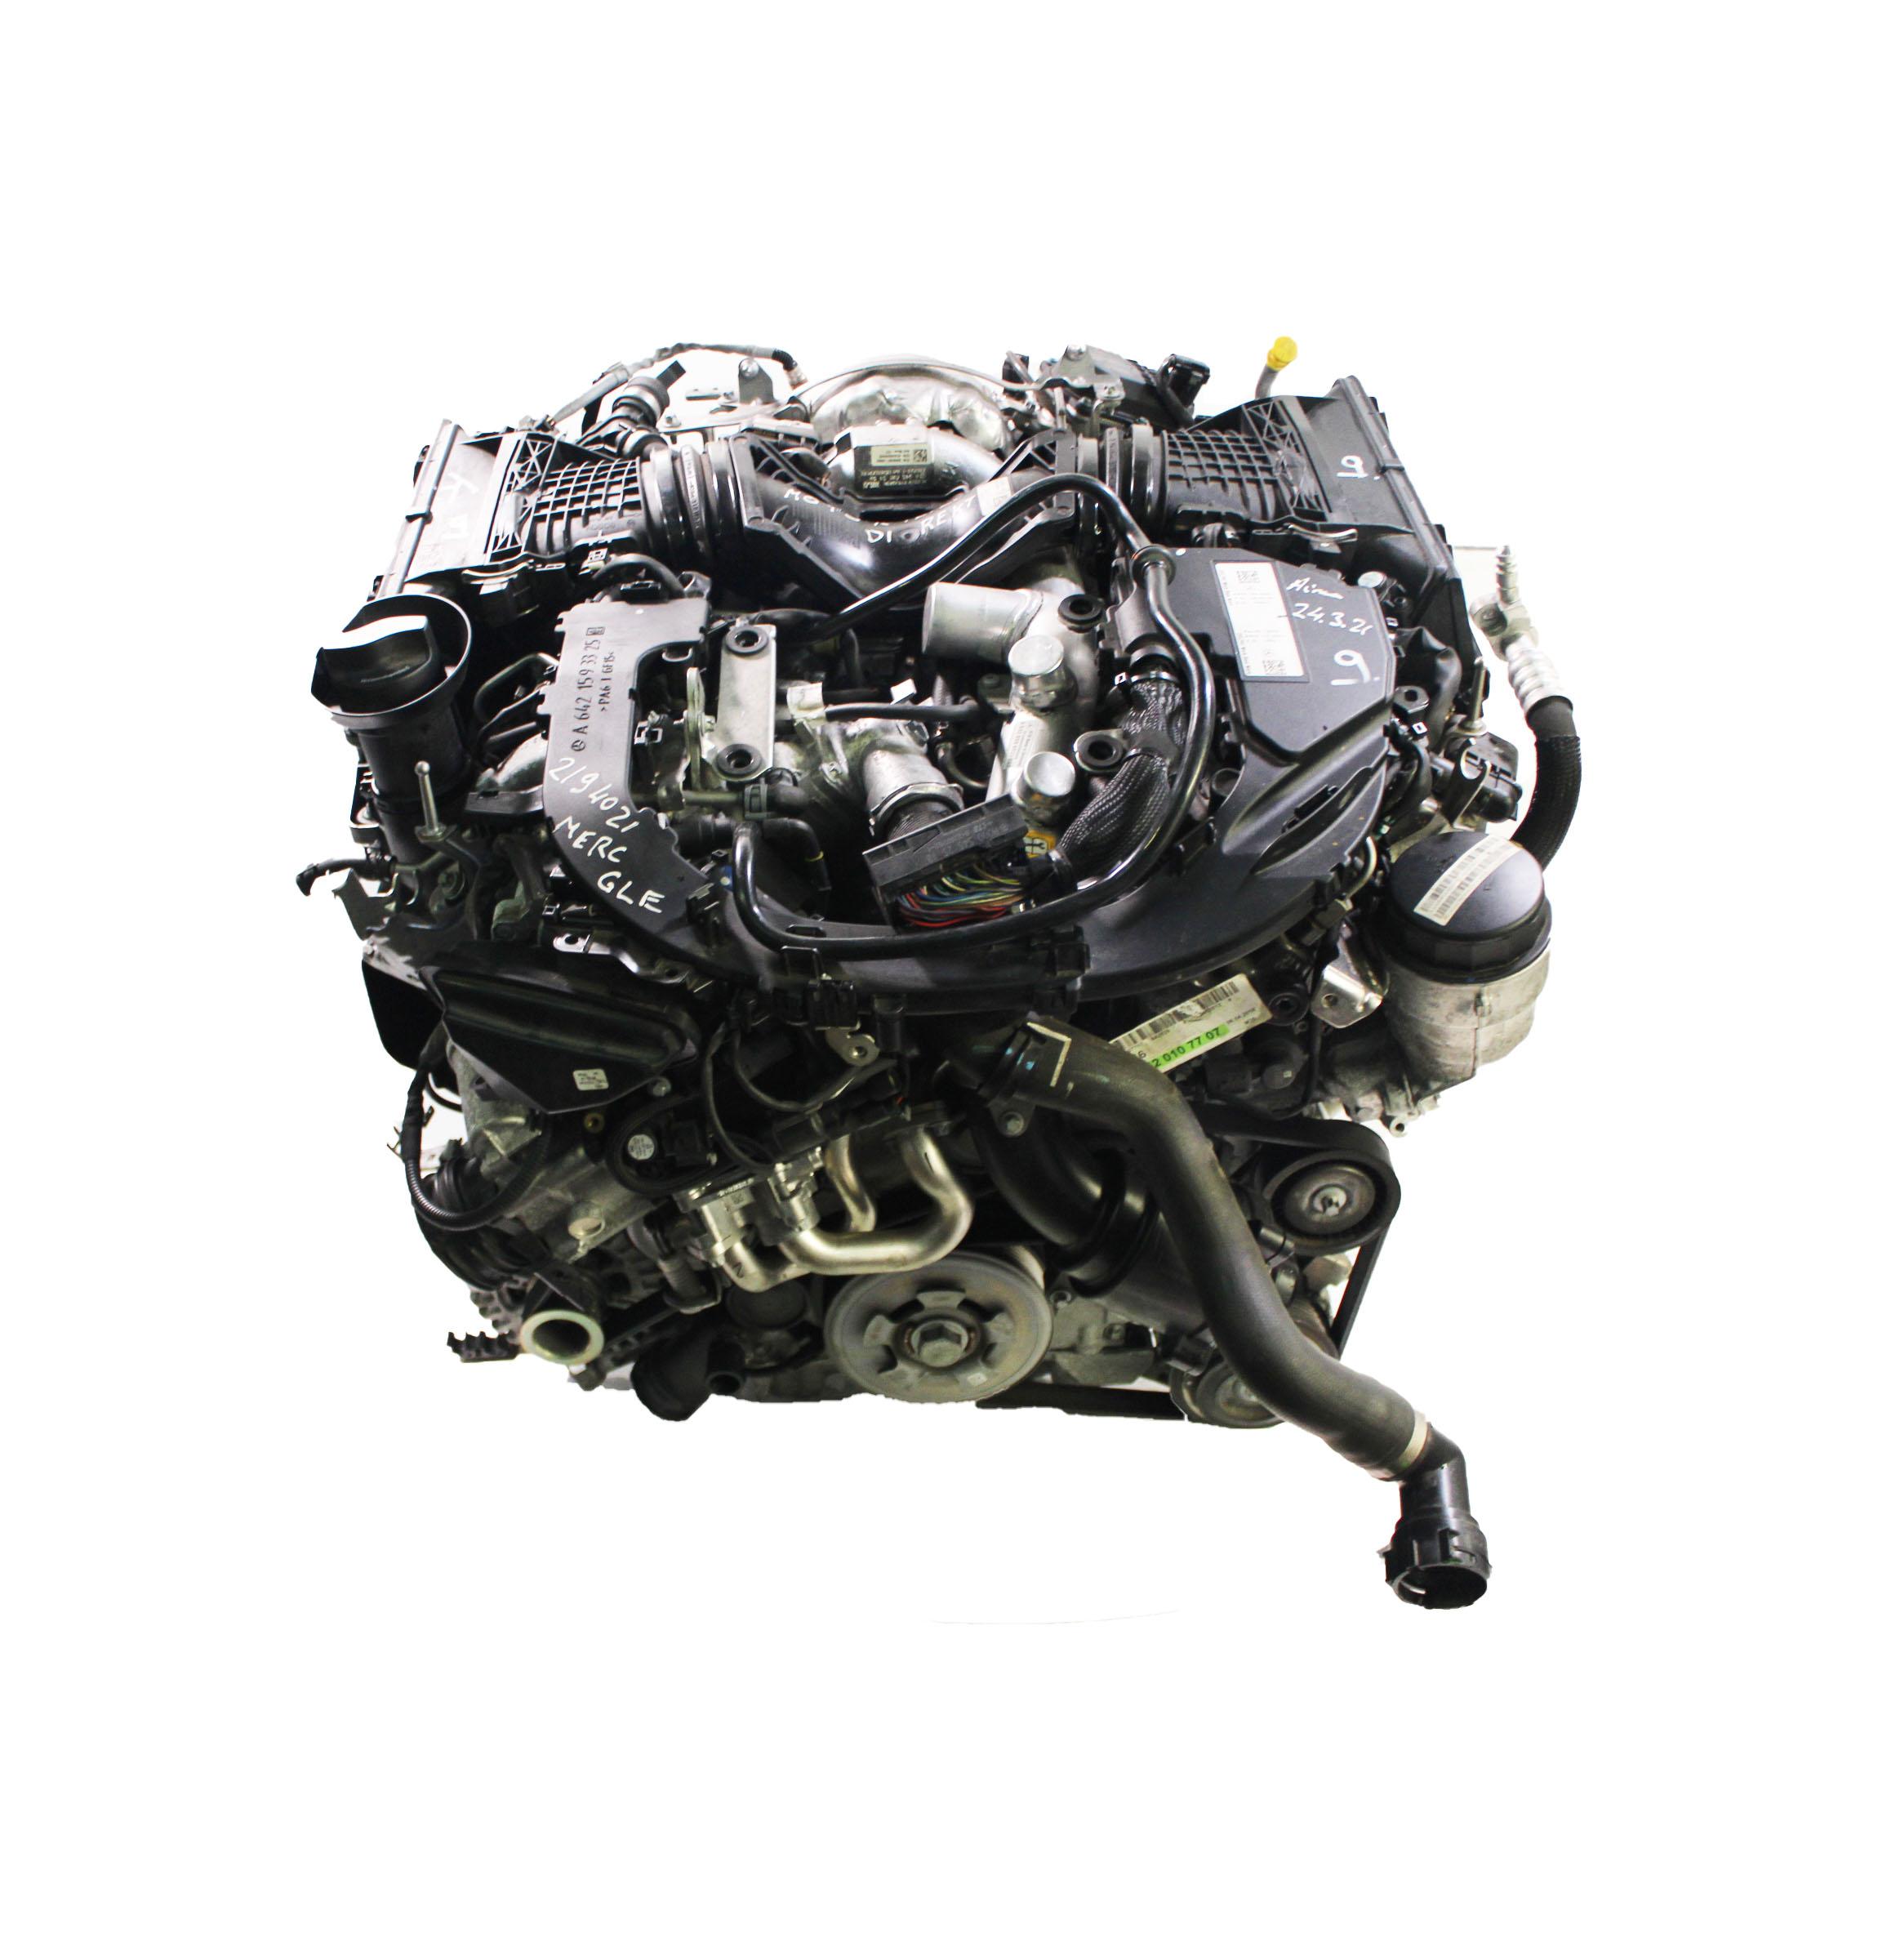 Motor 2018 für Mercedes Benz GLE W166 C295 350d 4-matic 3,0 642.826 OM642.826